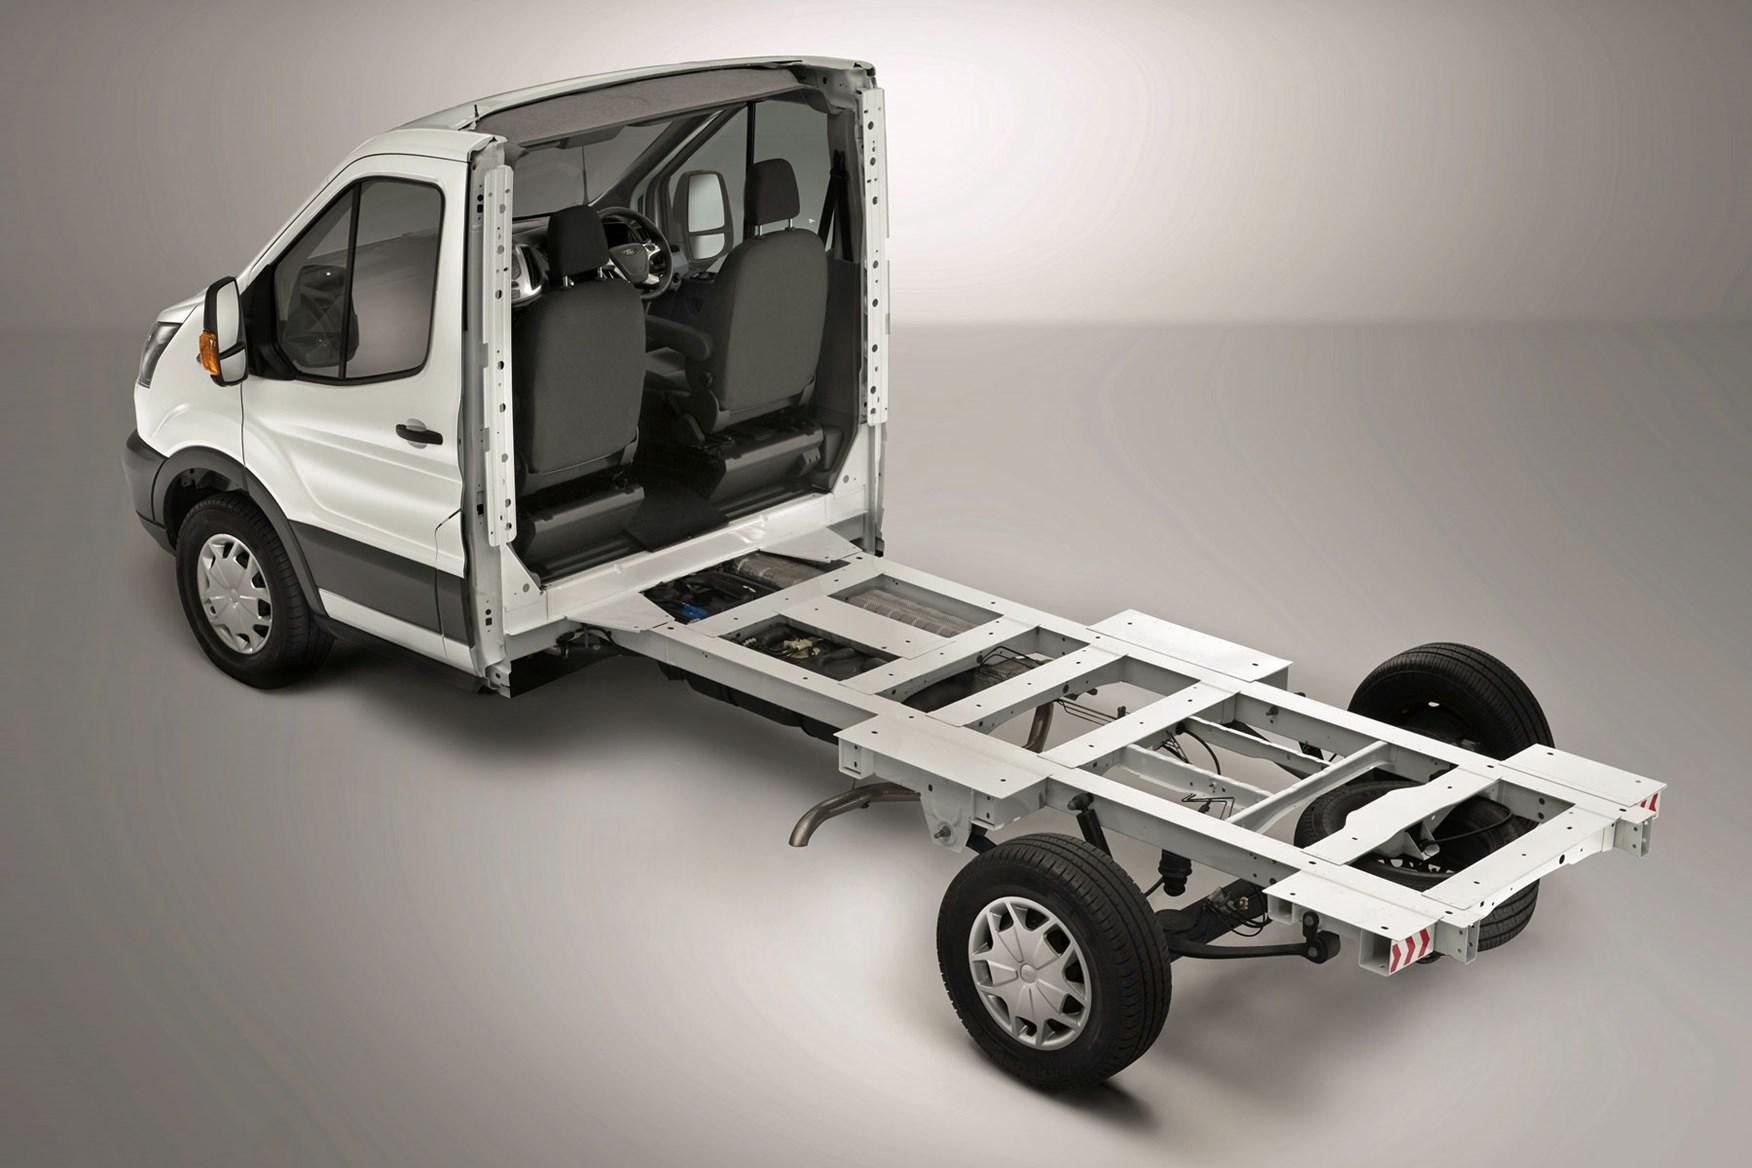 Ford Transit Van Dimensions Capacity Payload Volume